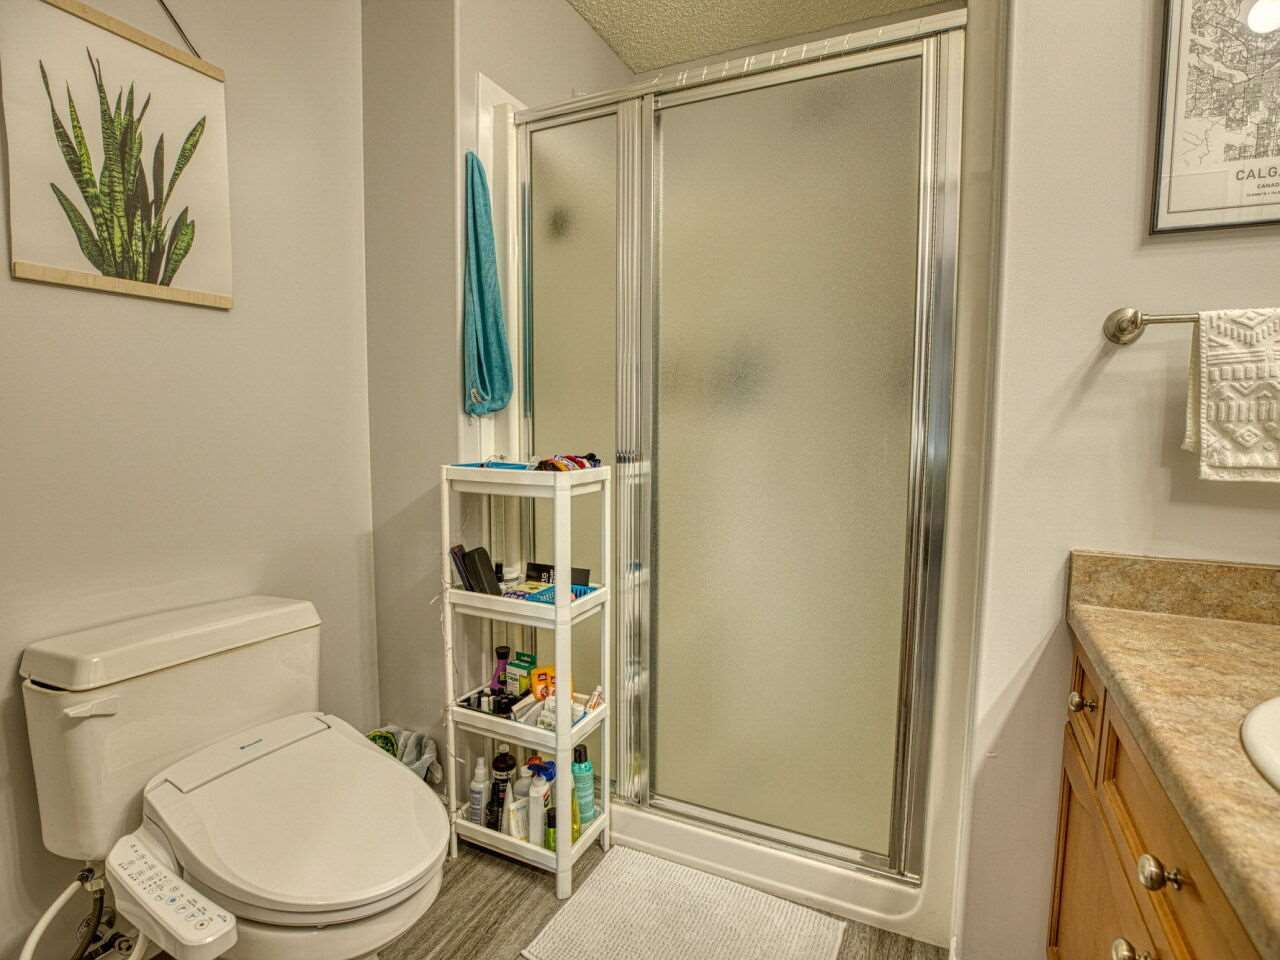 429 16807 100 Avenue - Glenwood_EDMO Lowrise Apartment for sale, 2 Bedrooms (E4234341) #23